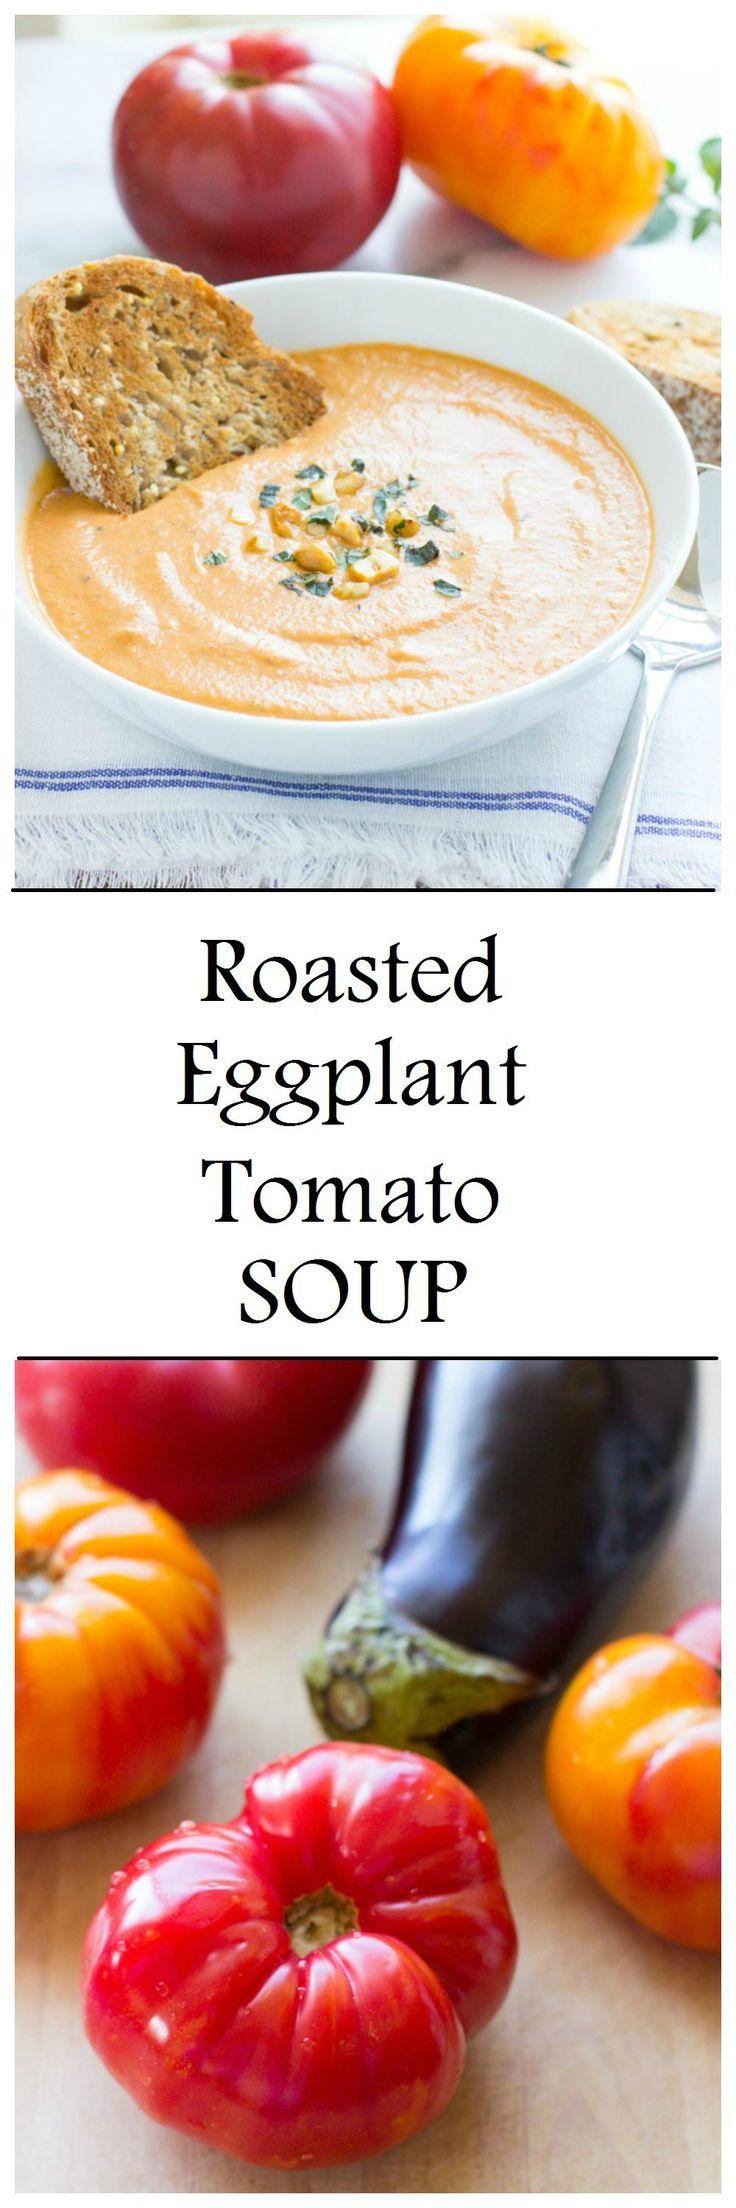 Creamy Roasted Eggplant & Tomato Soup #dairyfree #vegan #paleo